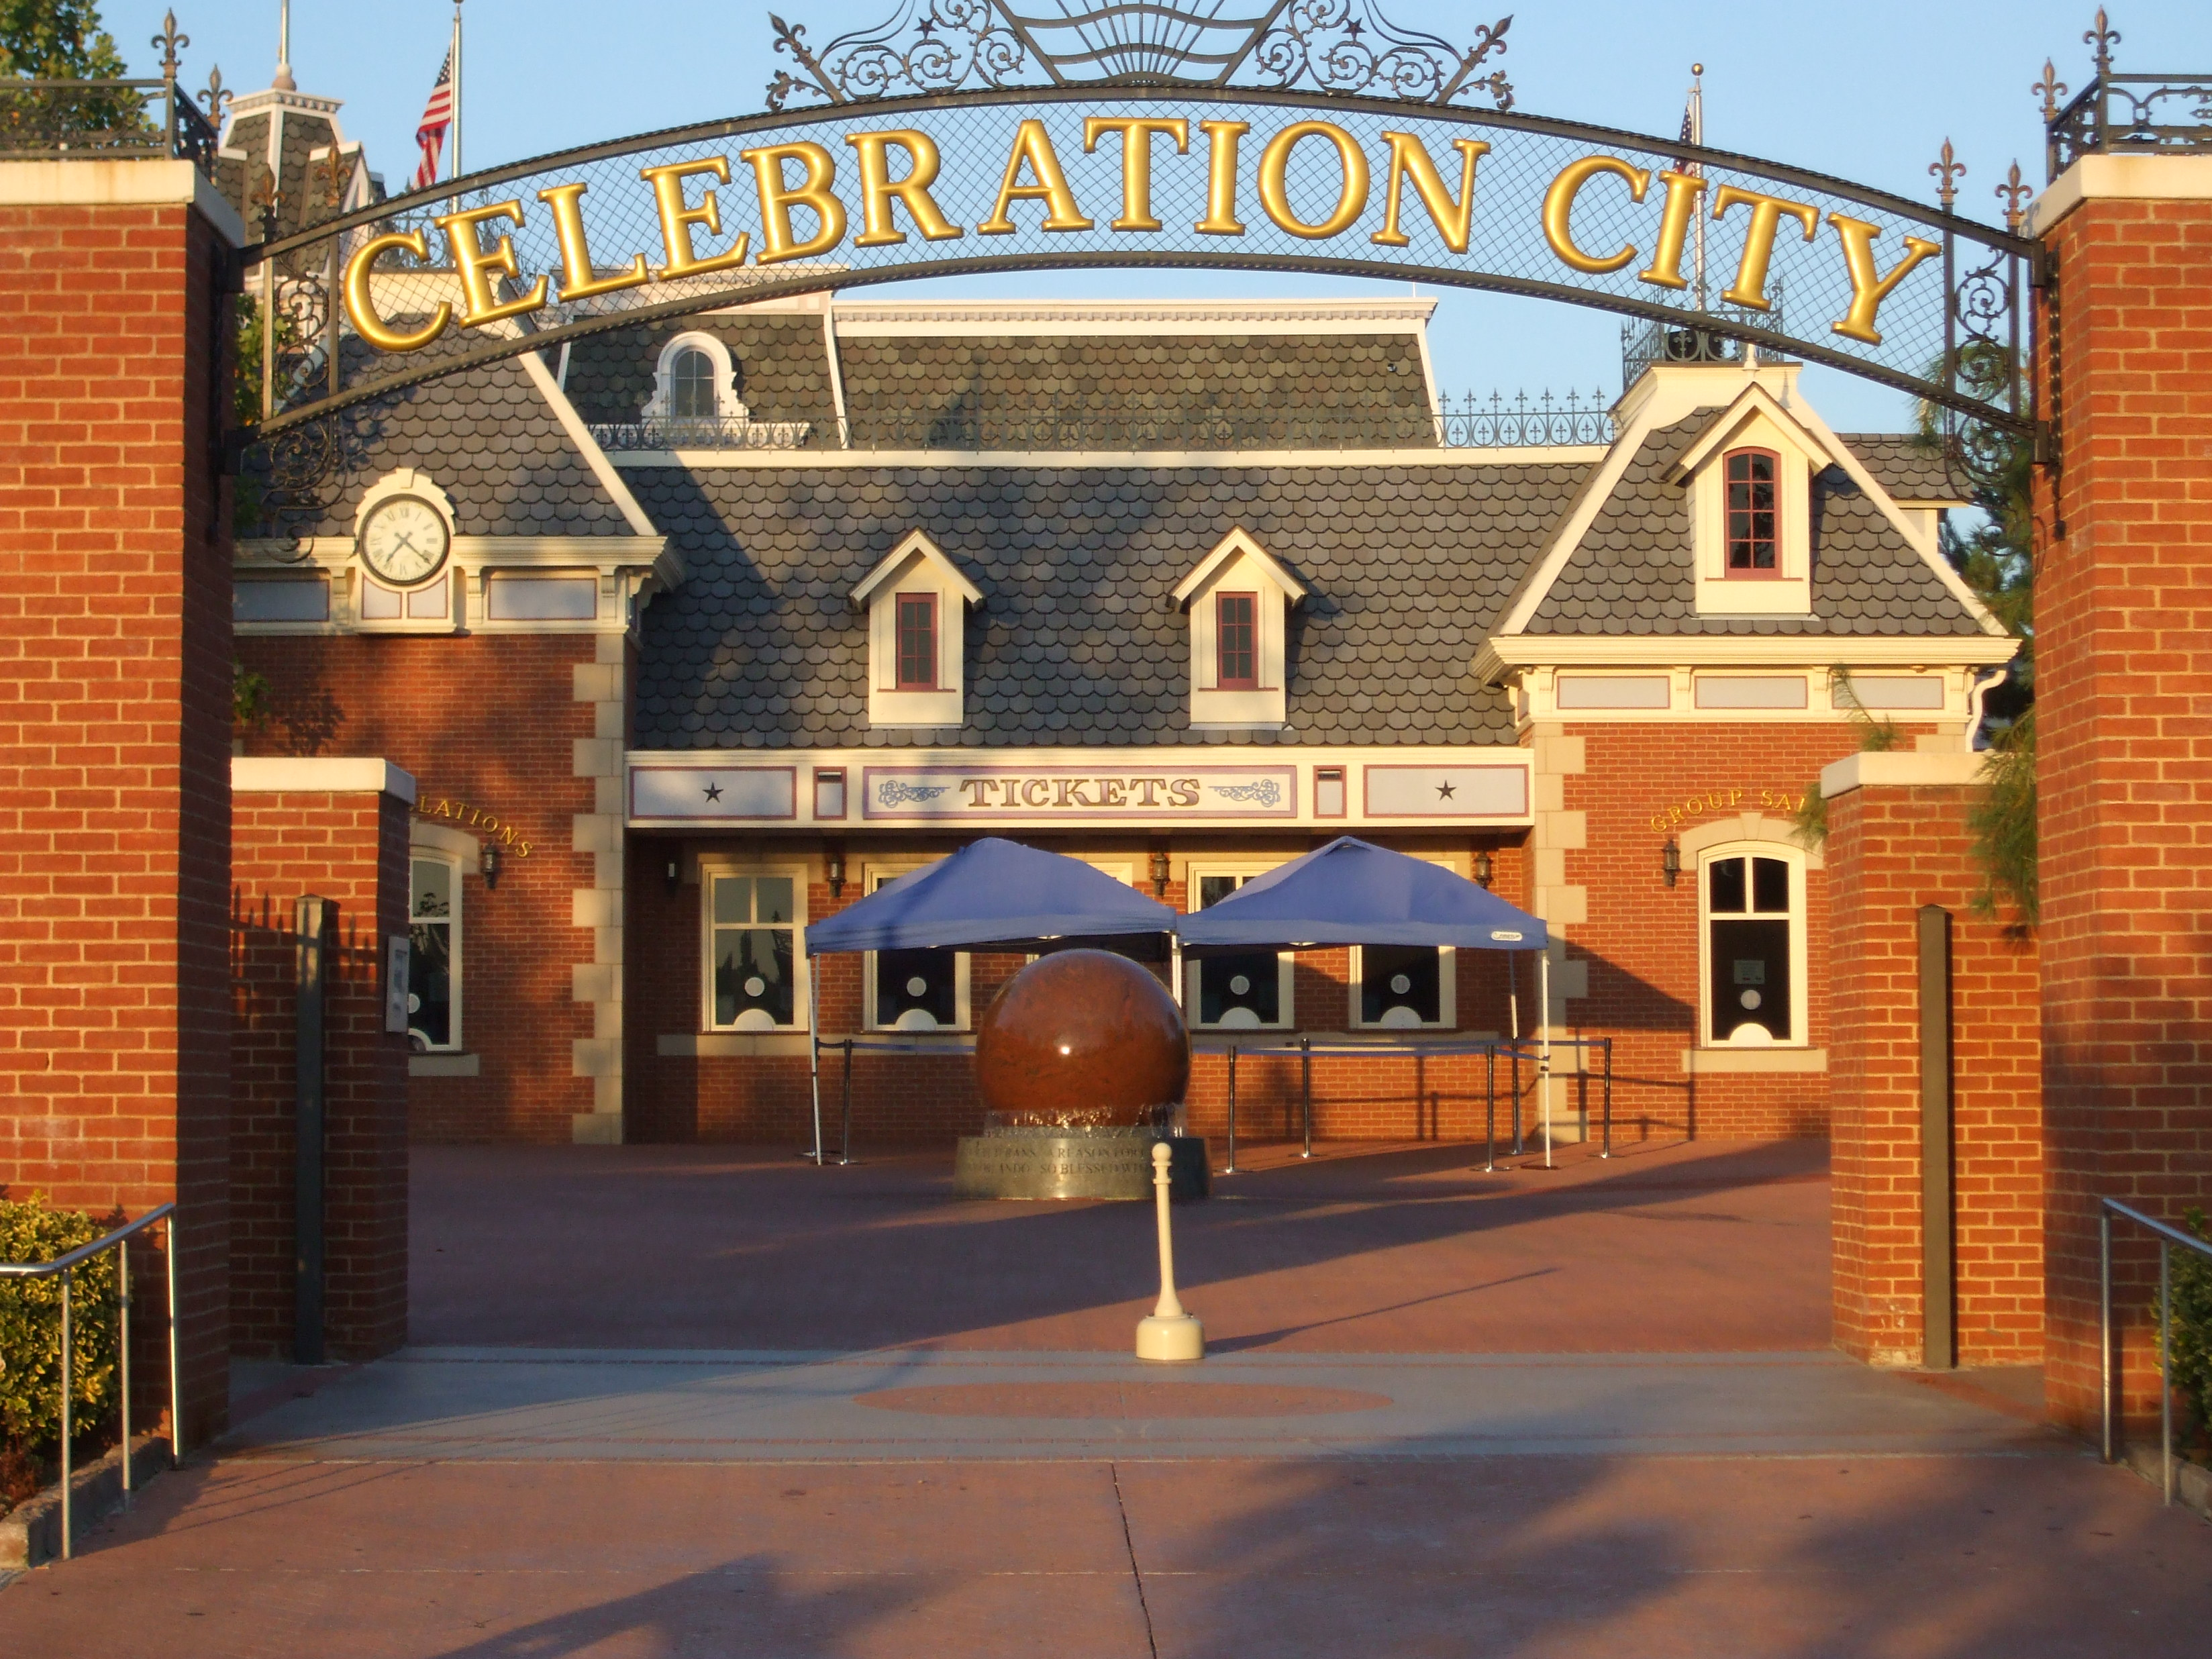 Celebration City Wikipedia